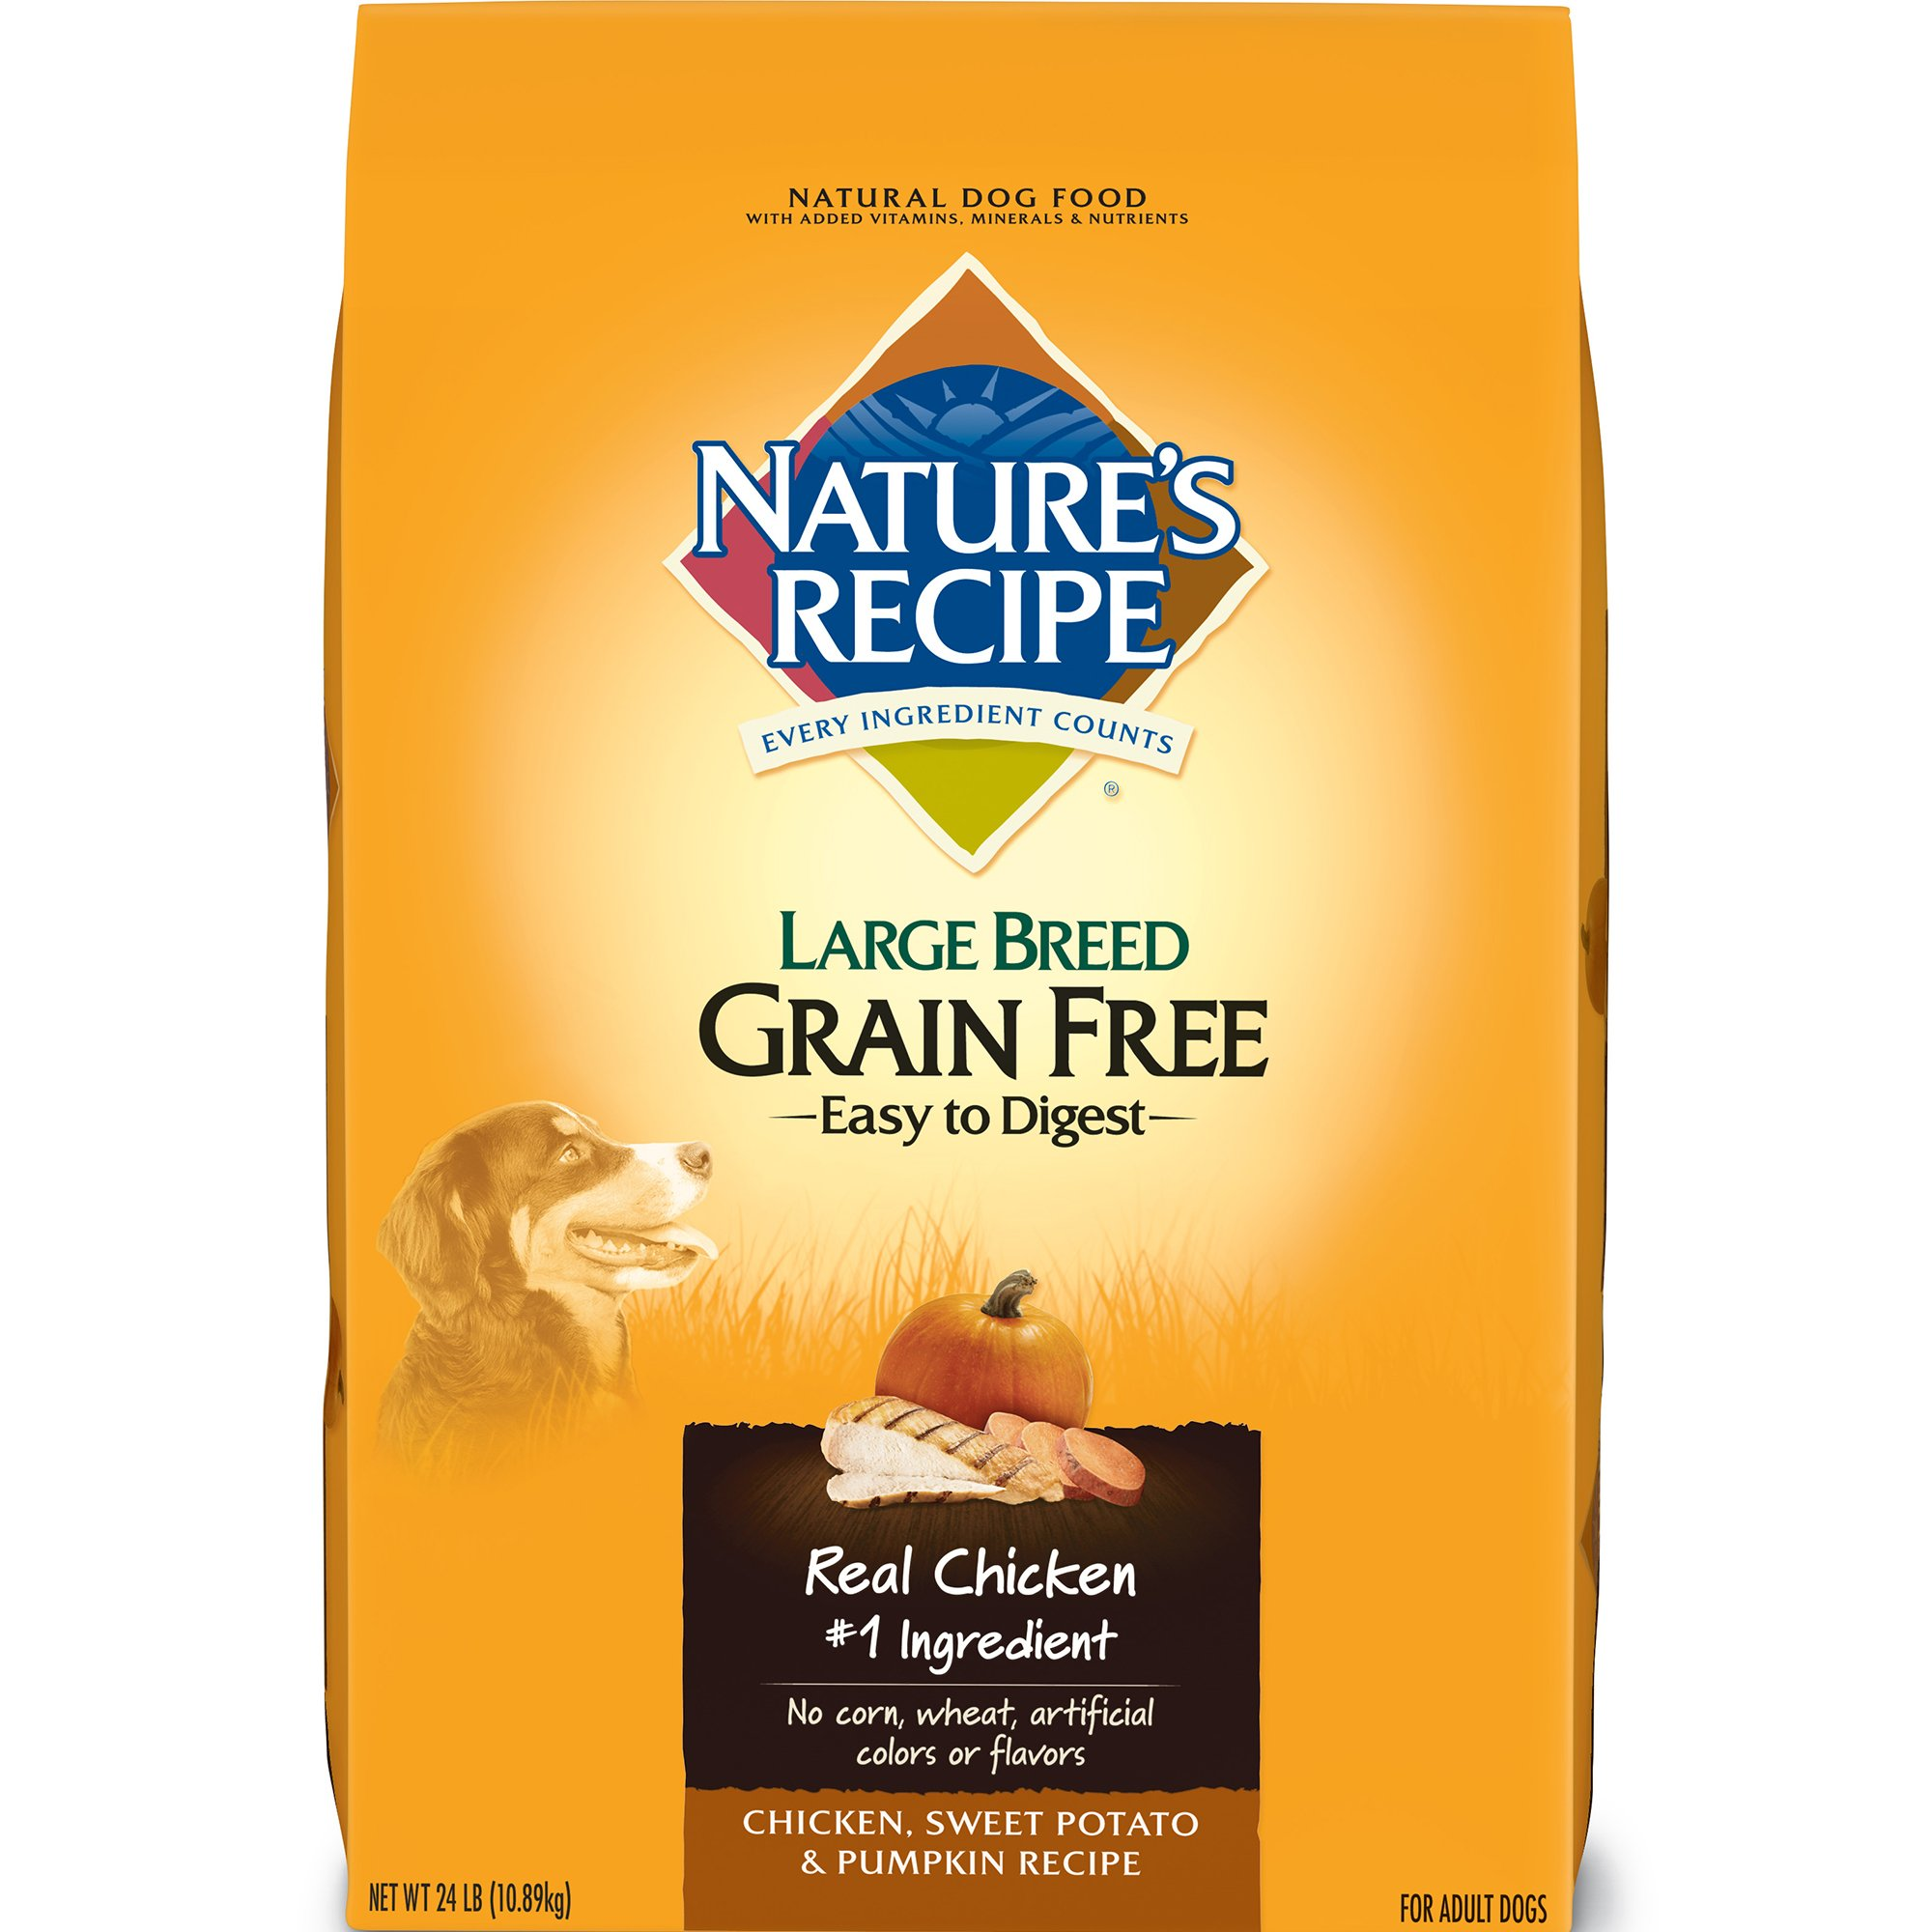 Natures recipe grain free chicken sweet potato pumpkin dry dog natures recipe grain free chicken sweet potato pumpkin large breed adult dog food forumfinder Gallery